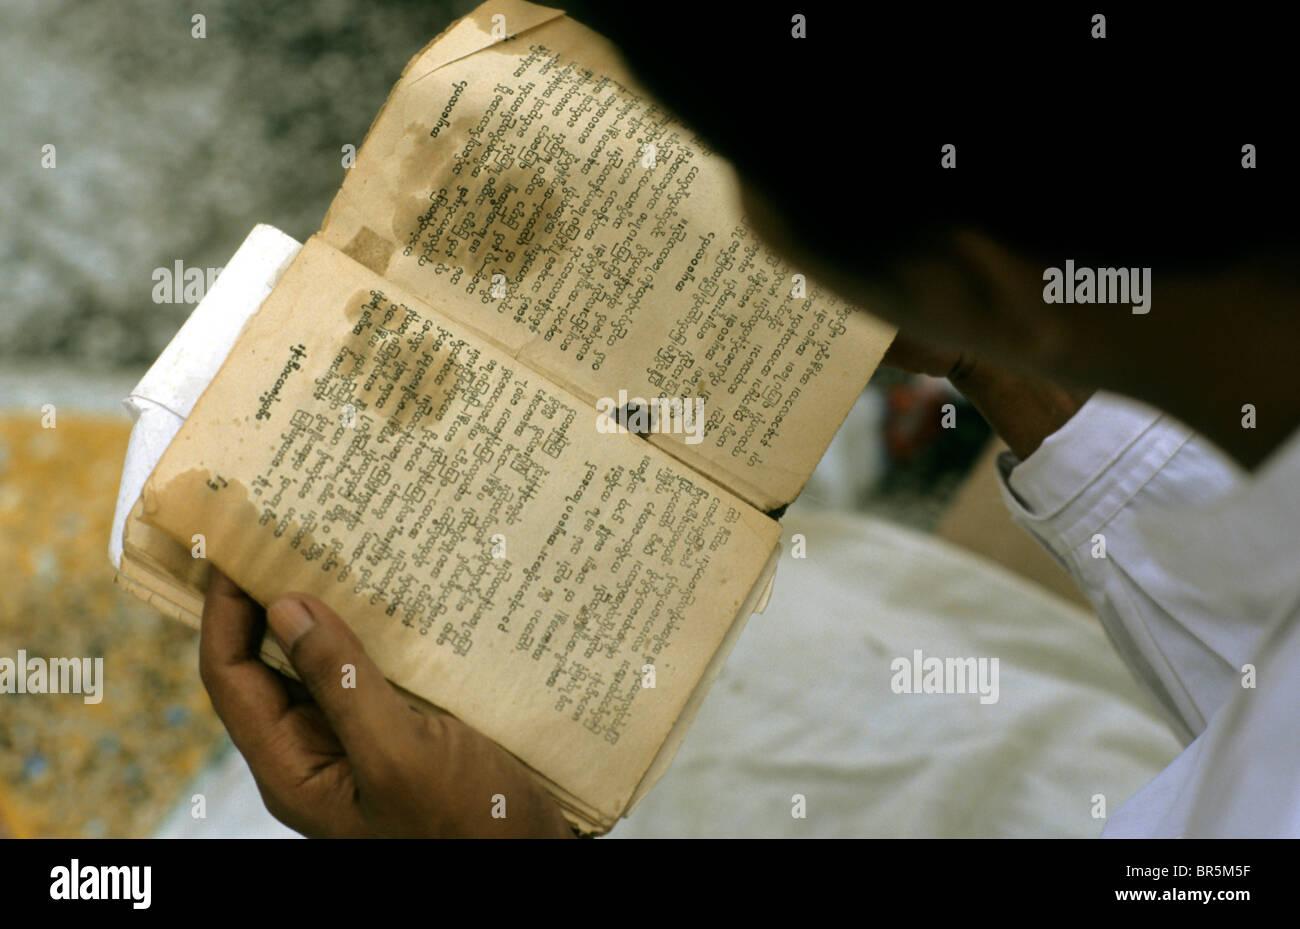 Man reading Buddhist writings, Burma, Myanmar, Asia - Stock Image